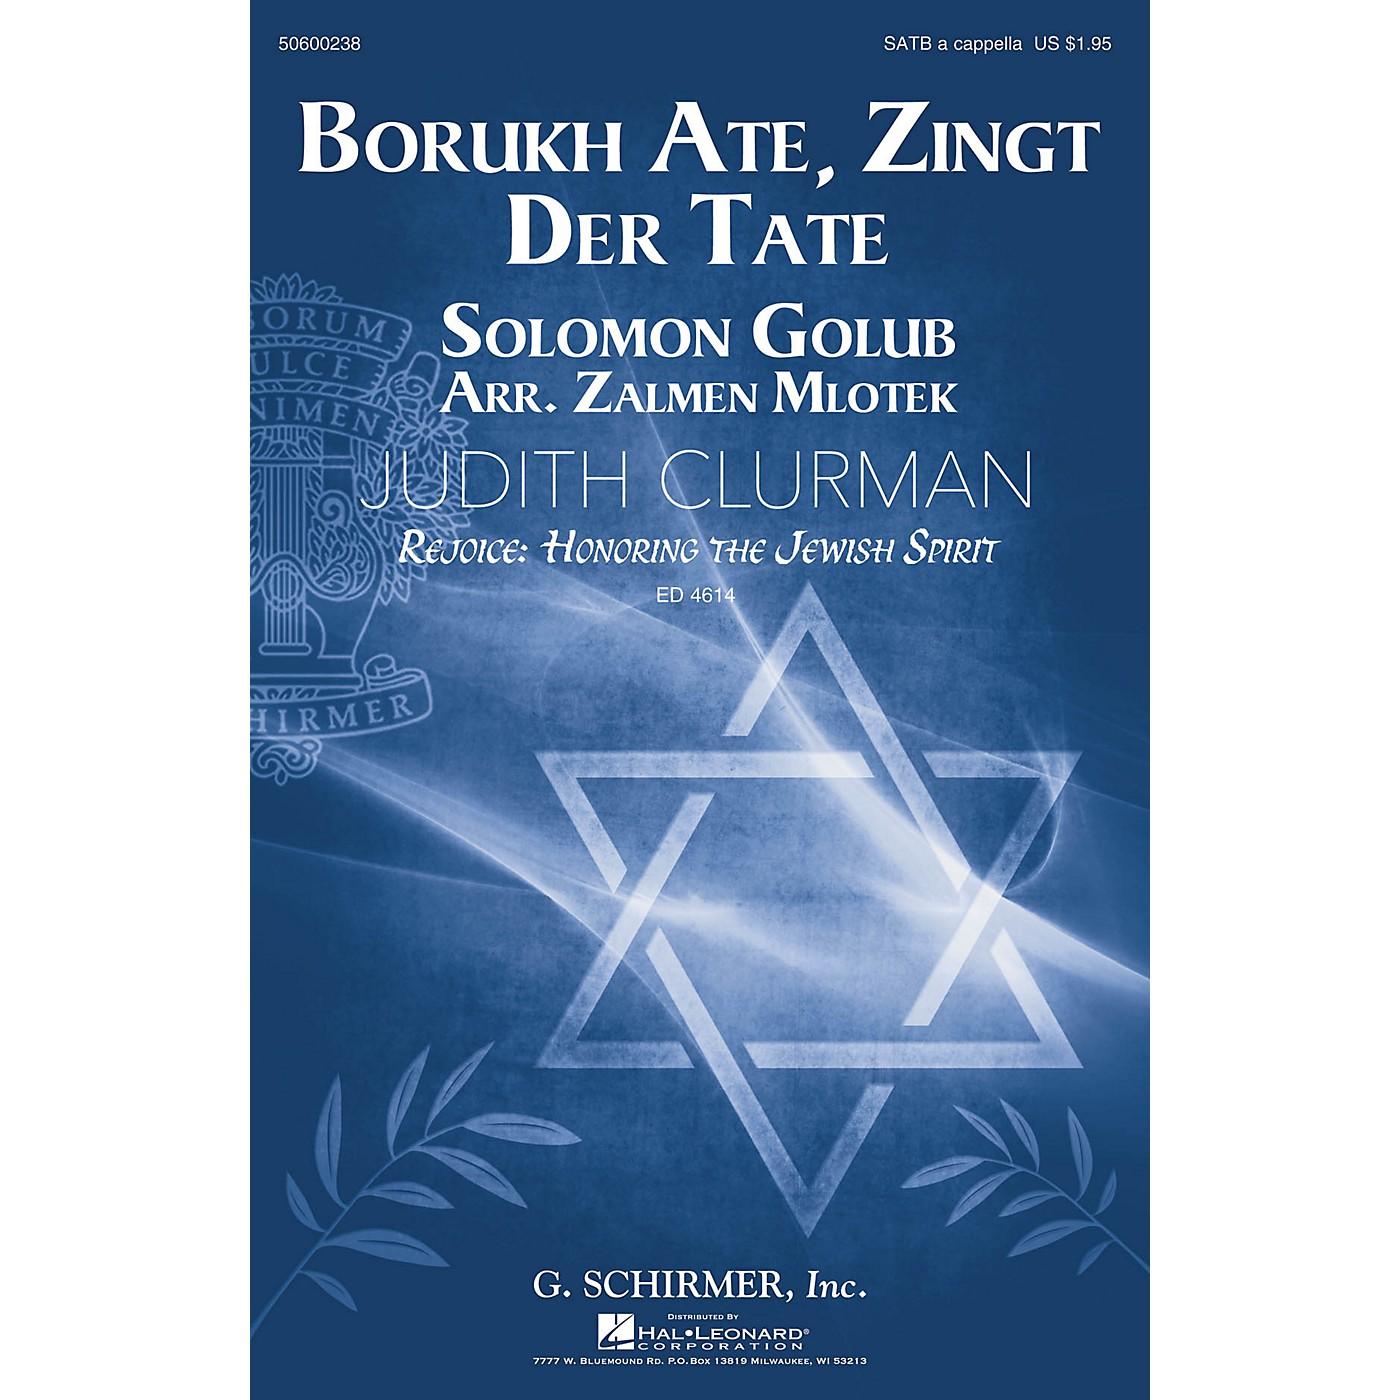 G. Schirmer Borukh Ate, Zingt Der Tate (Judith Clurman Choral Series) SATB a cappella arranged by Zalmen Mlotek thumbnail